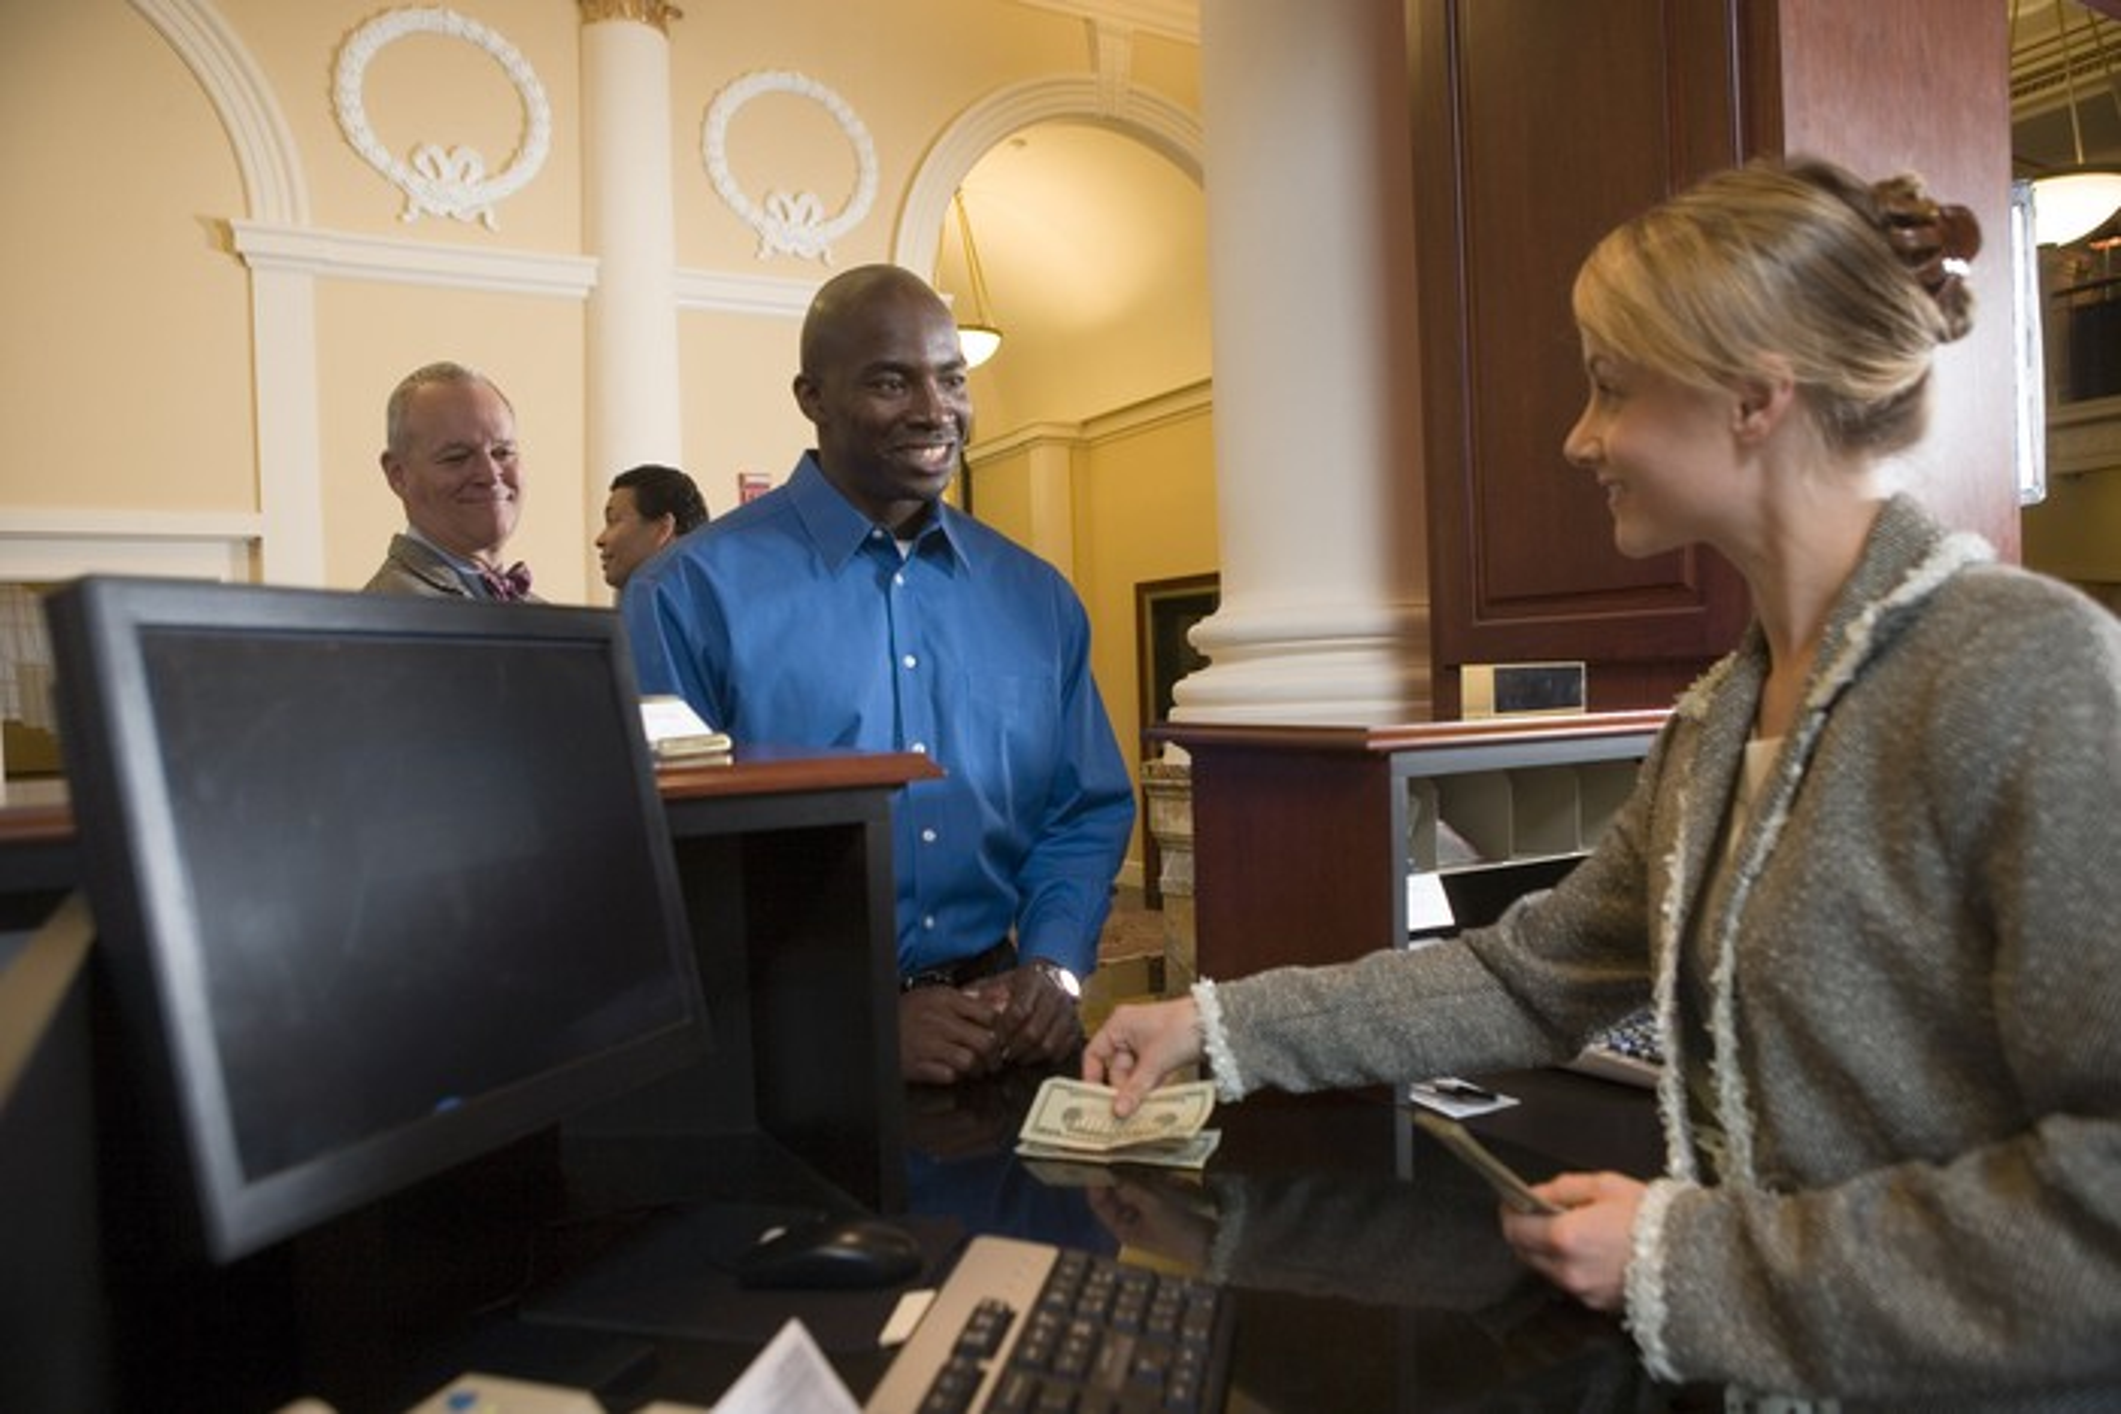 Man getting money from bank clerk